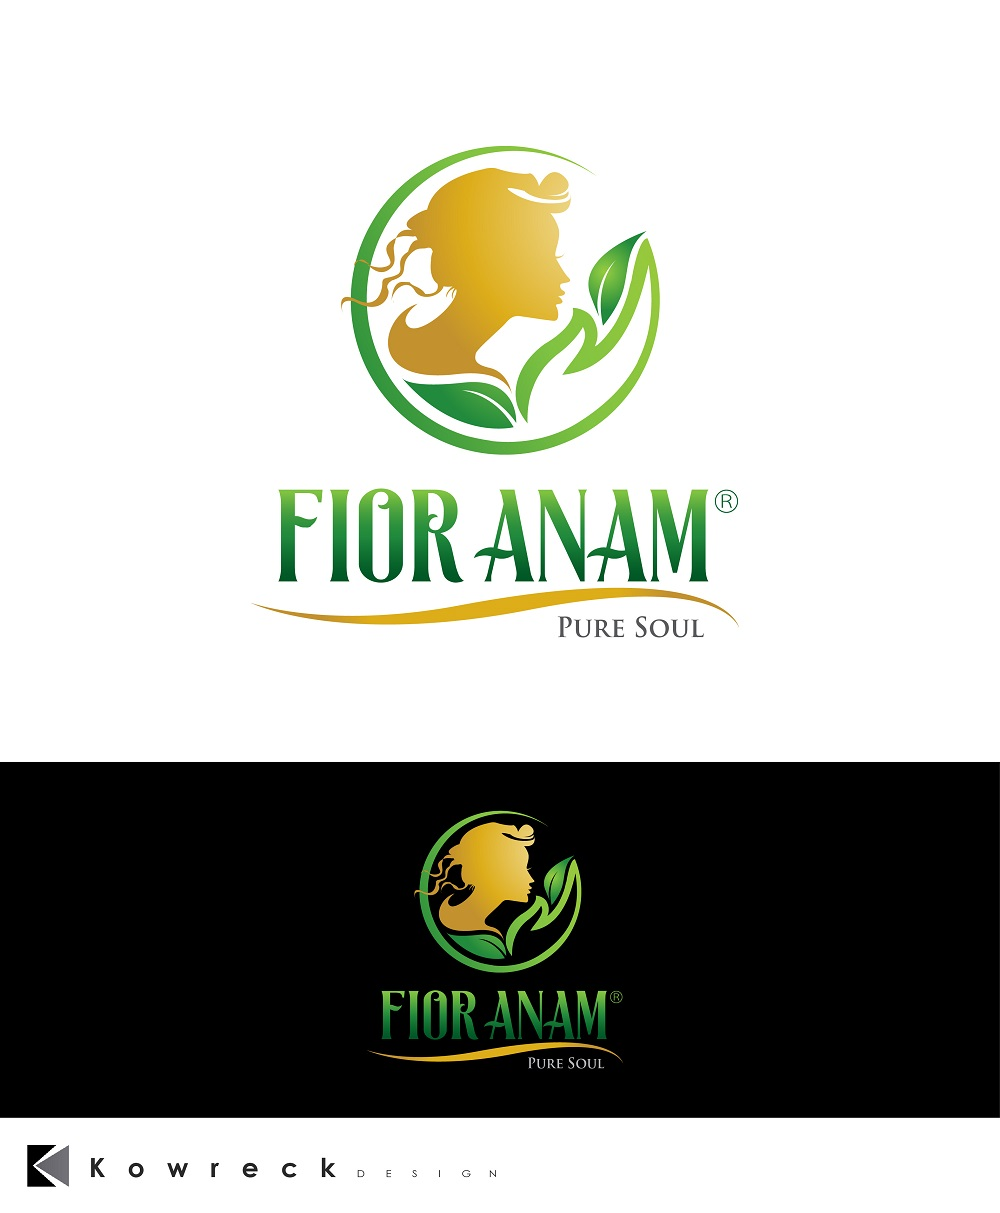 Logo Design by kowreck - Entry No. 384 in the Logo Design Contest Creative Logo Design for Fior Anam.